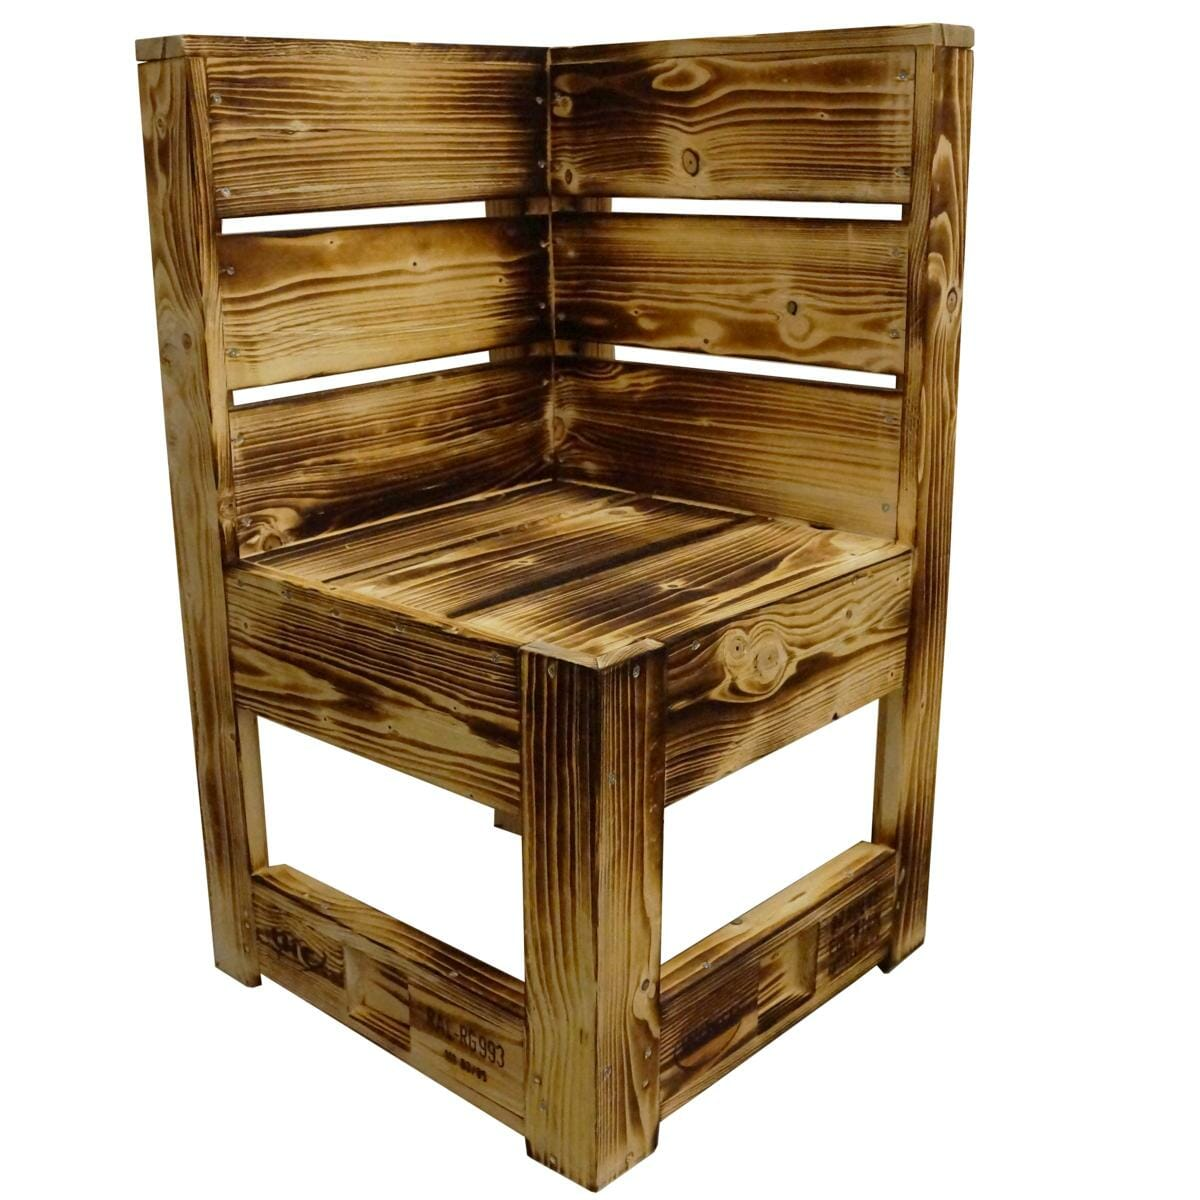 geflammte sitzecke bank aus paletten europaletten. Black Bedroom Furniture Sets. Home Design Ideas